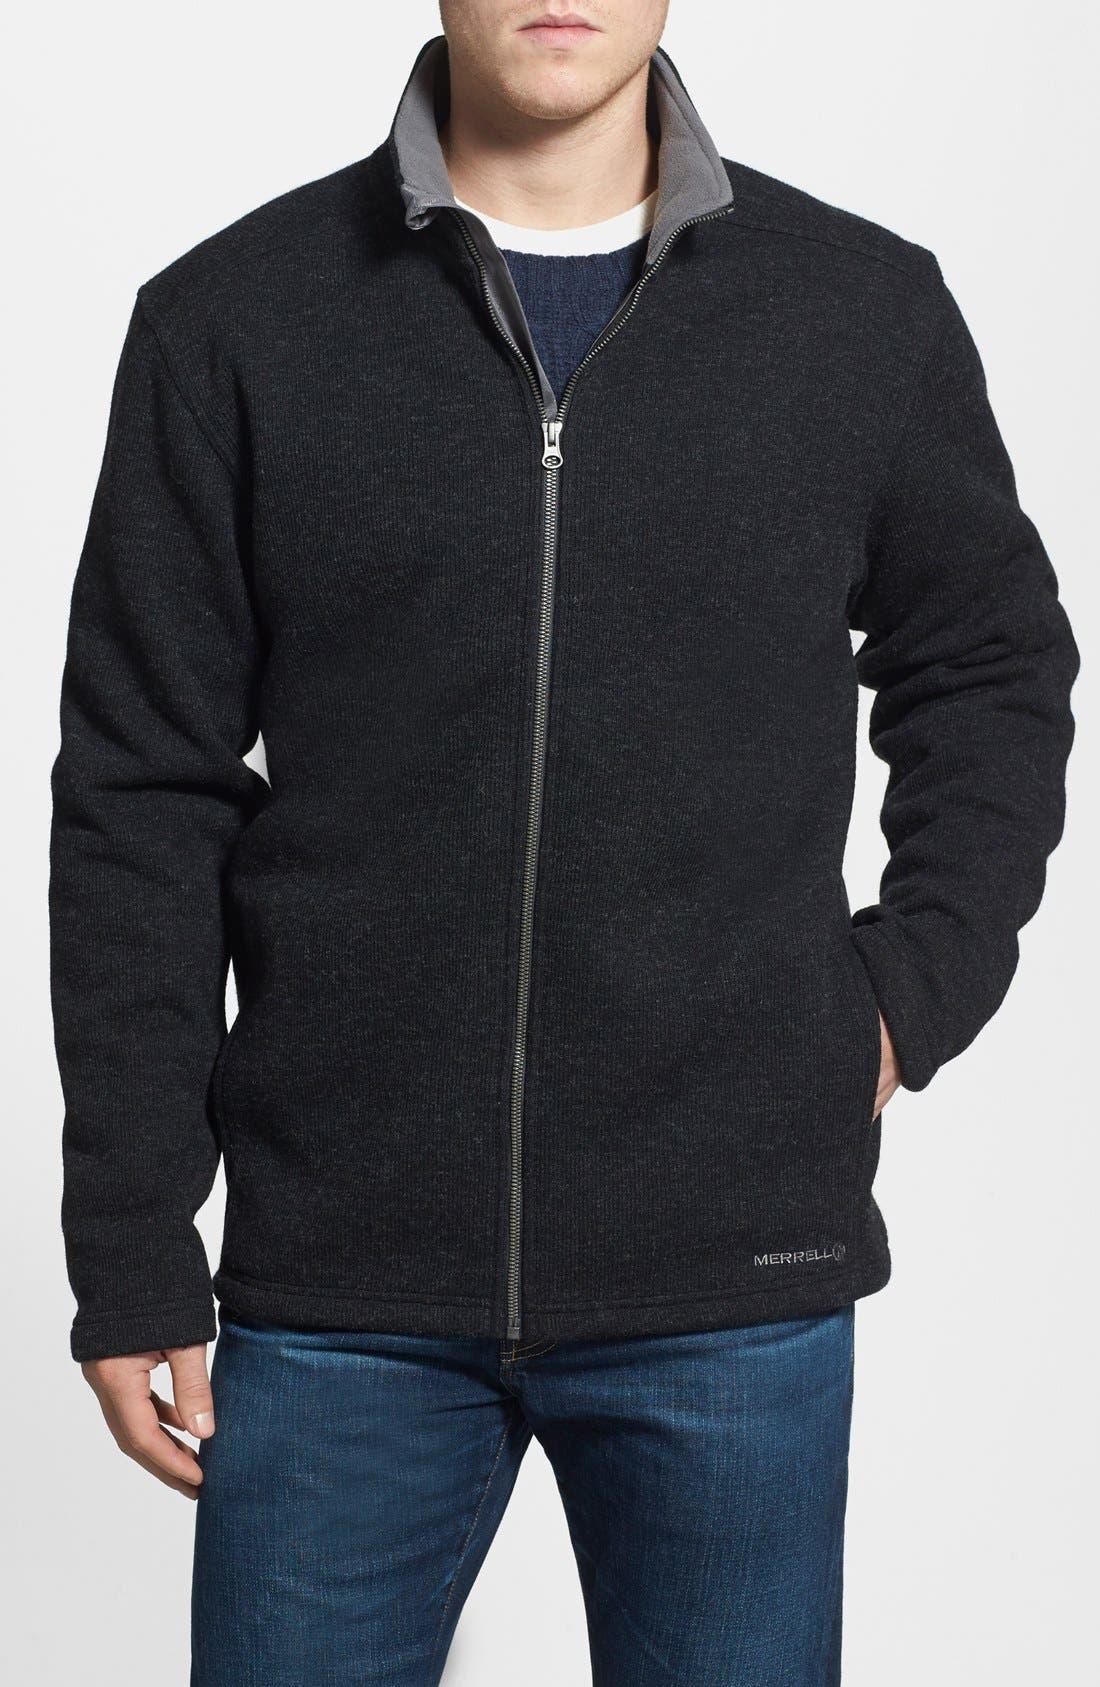 Alternate Image 1 Selected - Merrell 'Big Sky' Fleece Knit Jacket (Online Only)